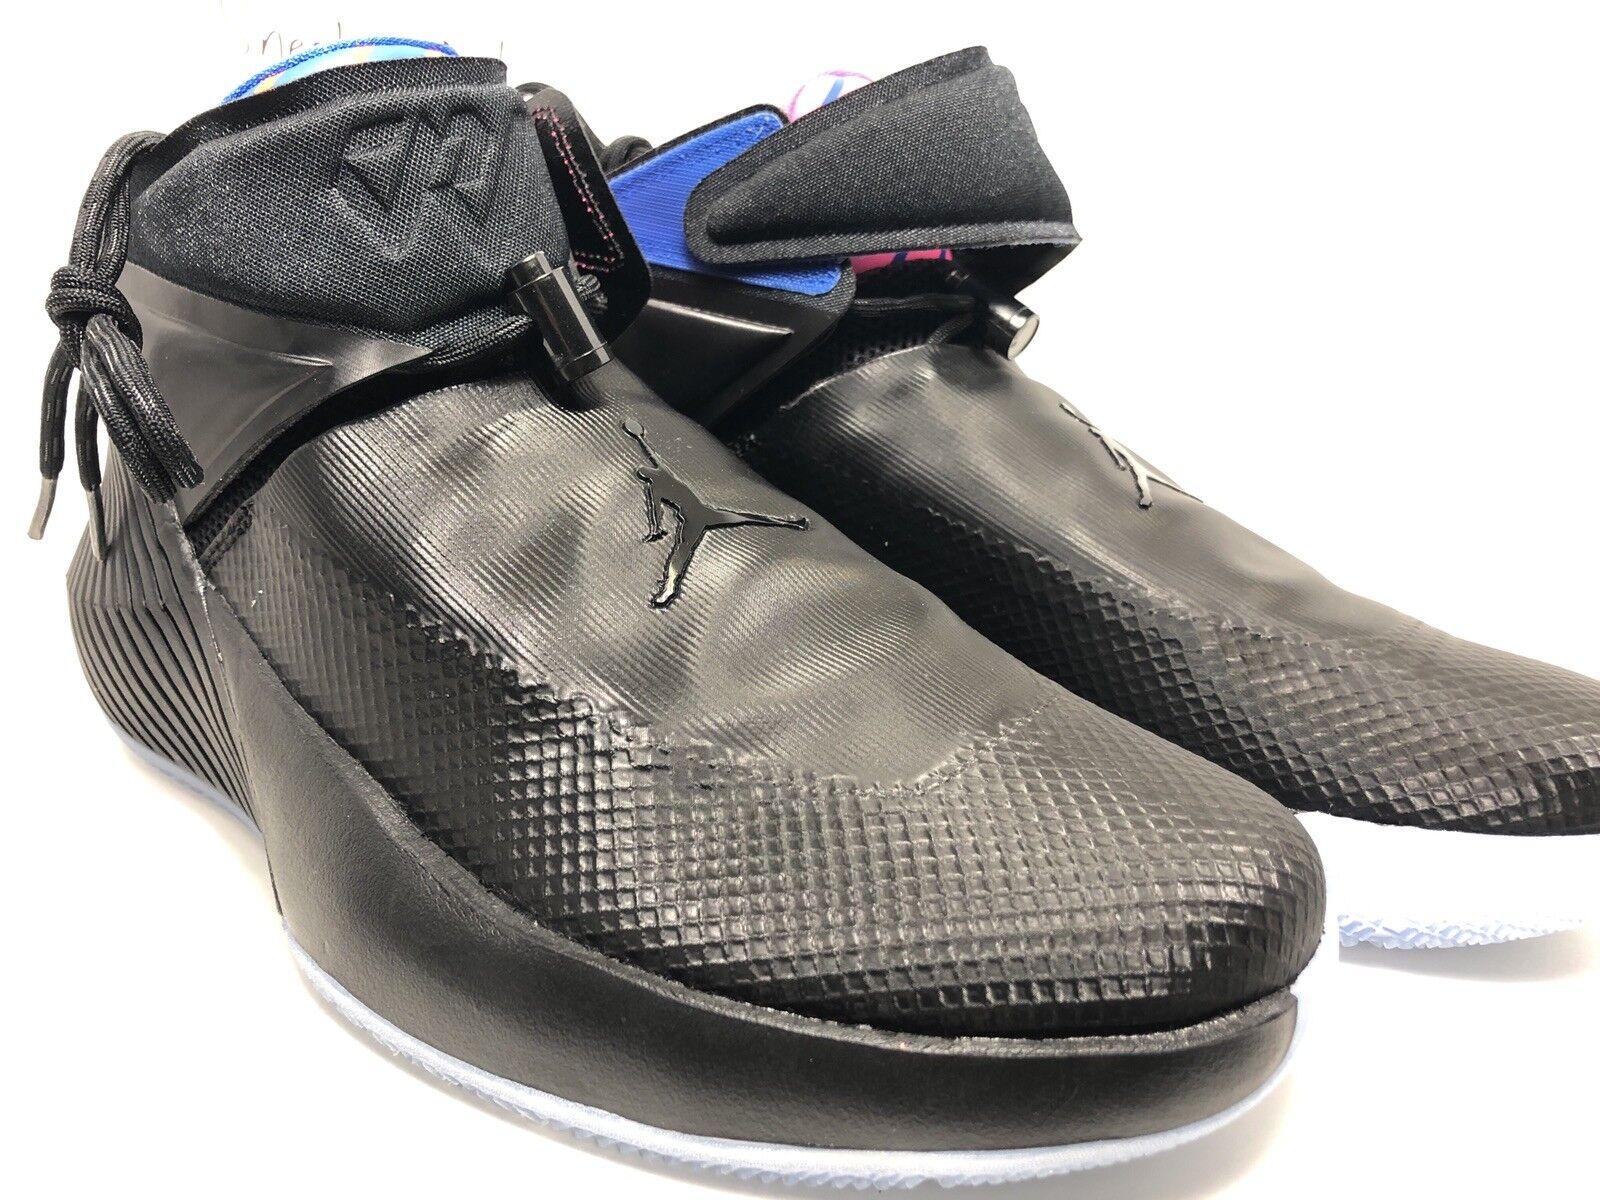 Nike Air Jordan Why Not Zero.1Black Pink AA2510-024 Russell Westbrook Size 10.5